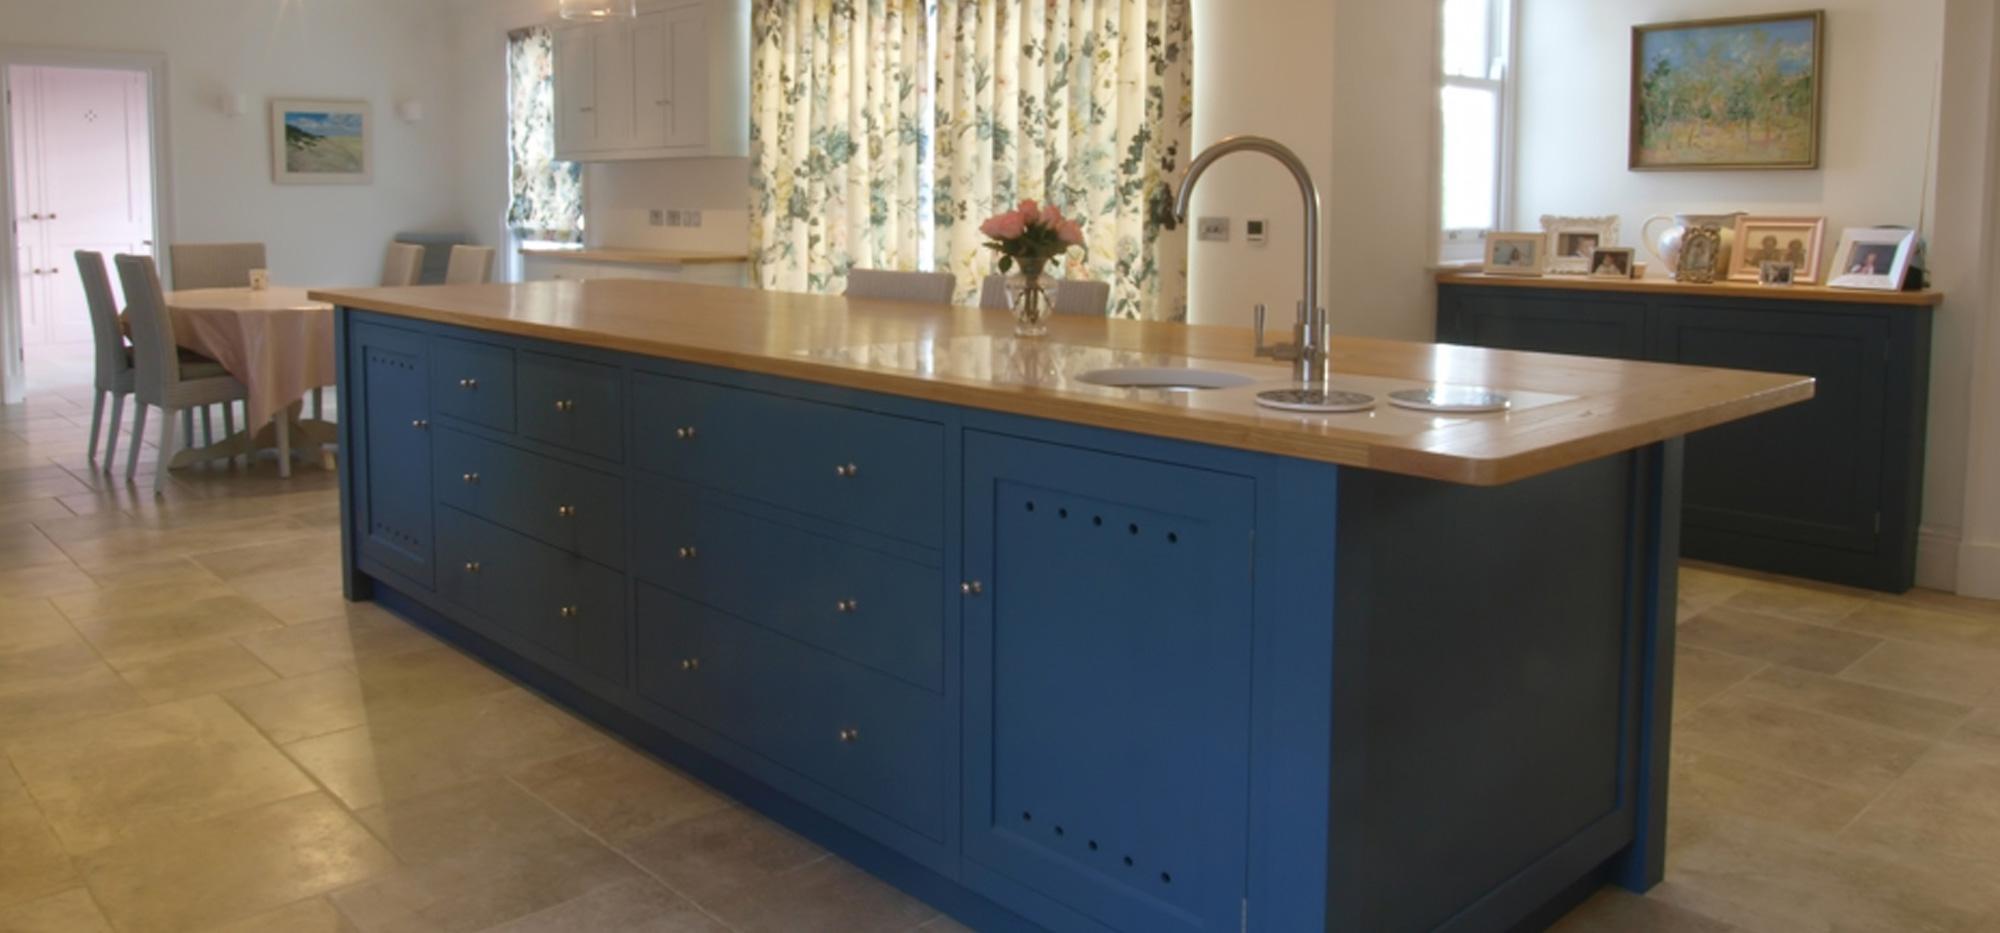 Stylish Wood and Stone Kitchens - Ipswich, Suffolk IP4 3QL - 01473 216300 | ShowMeLocal.com